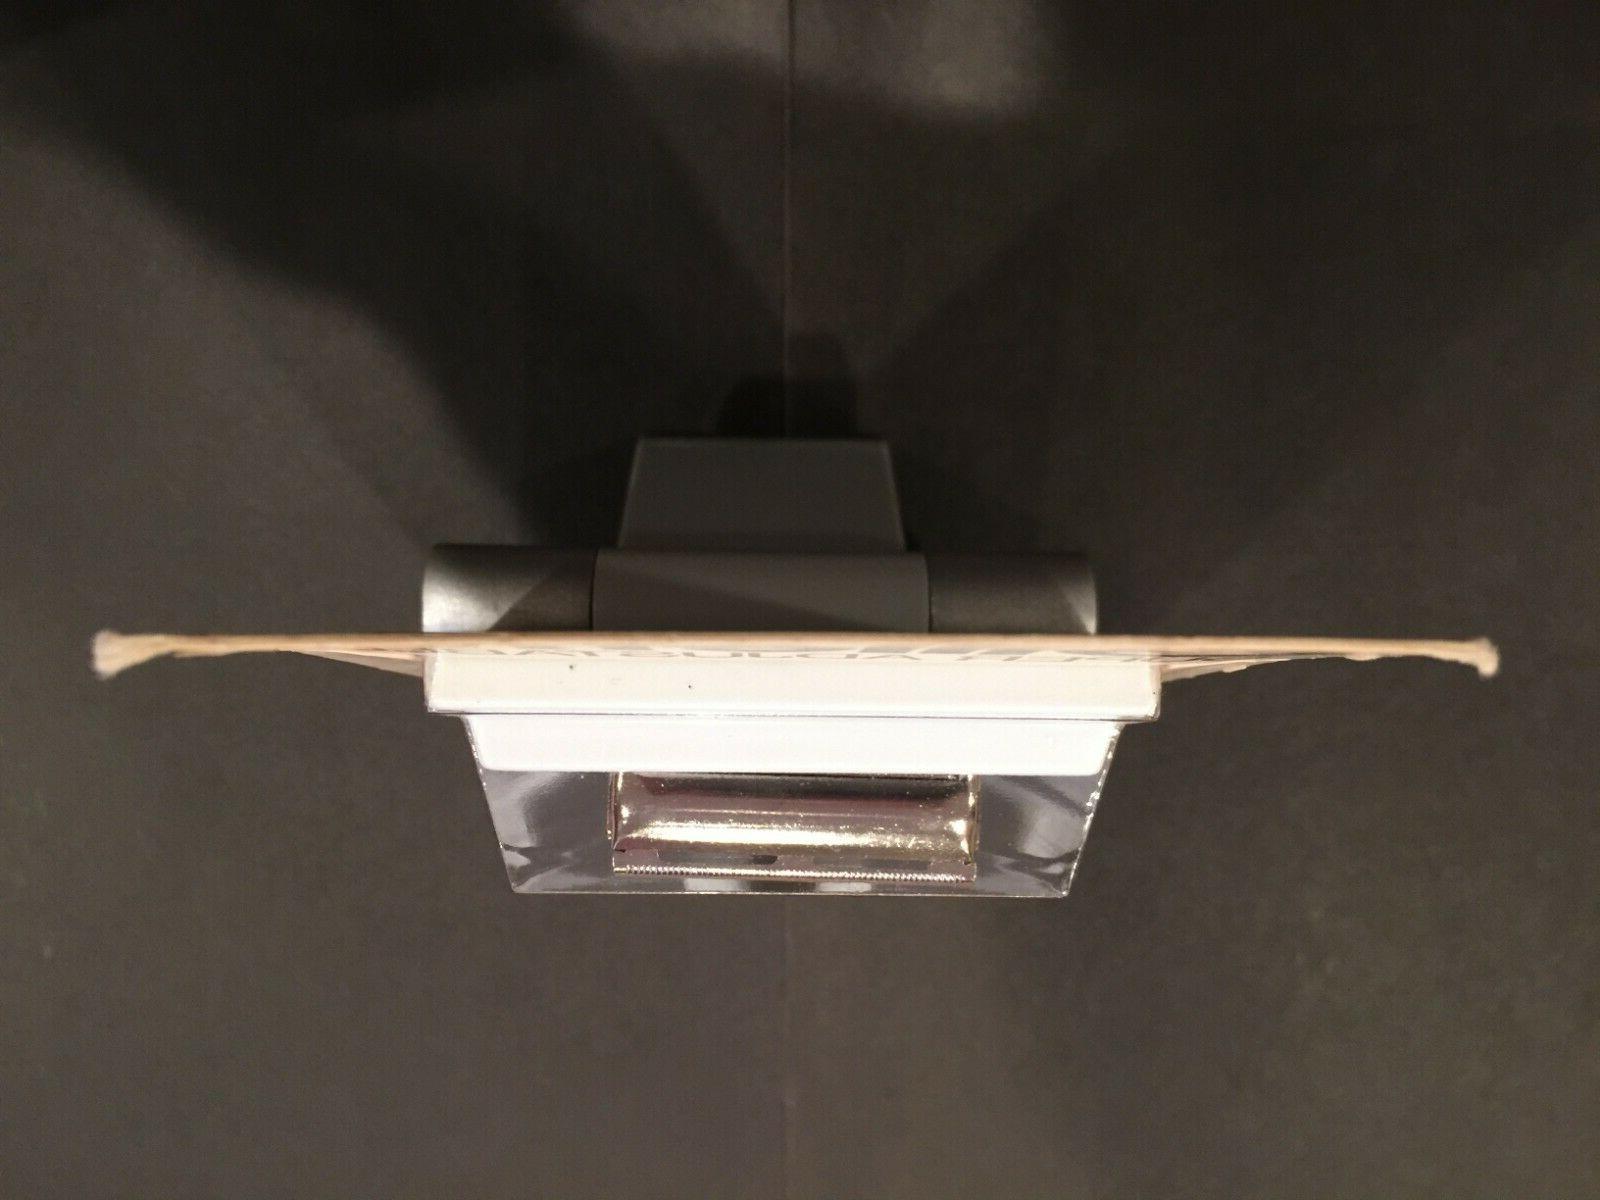 Gillette Super Adjustable Black Beauty Razor Platinum-Plus New